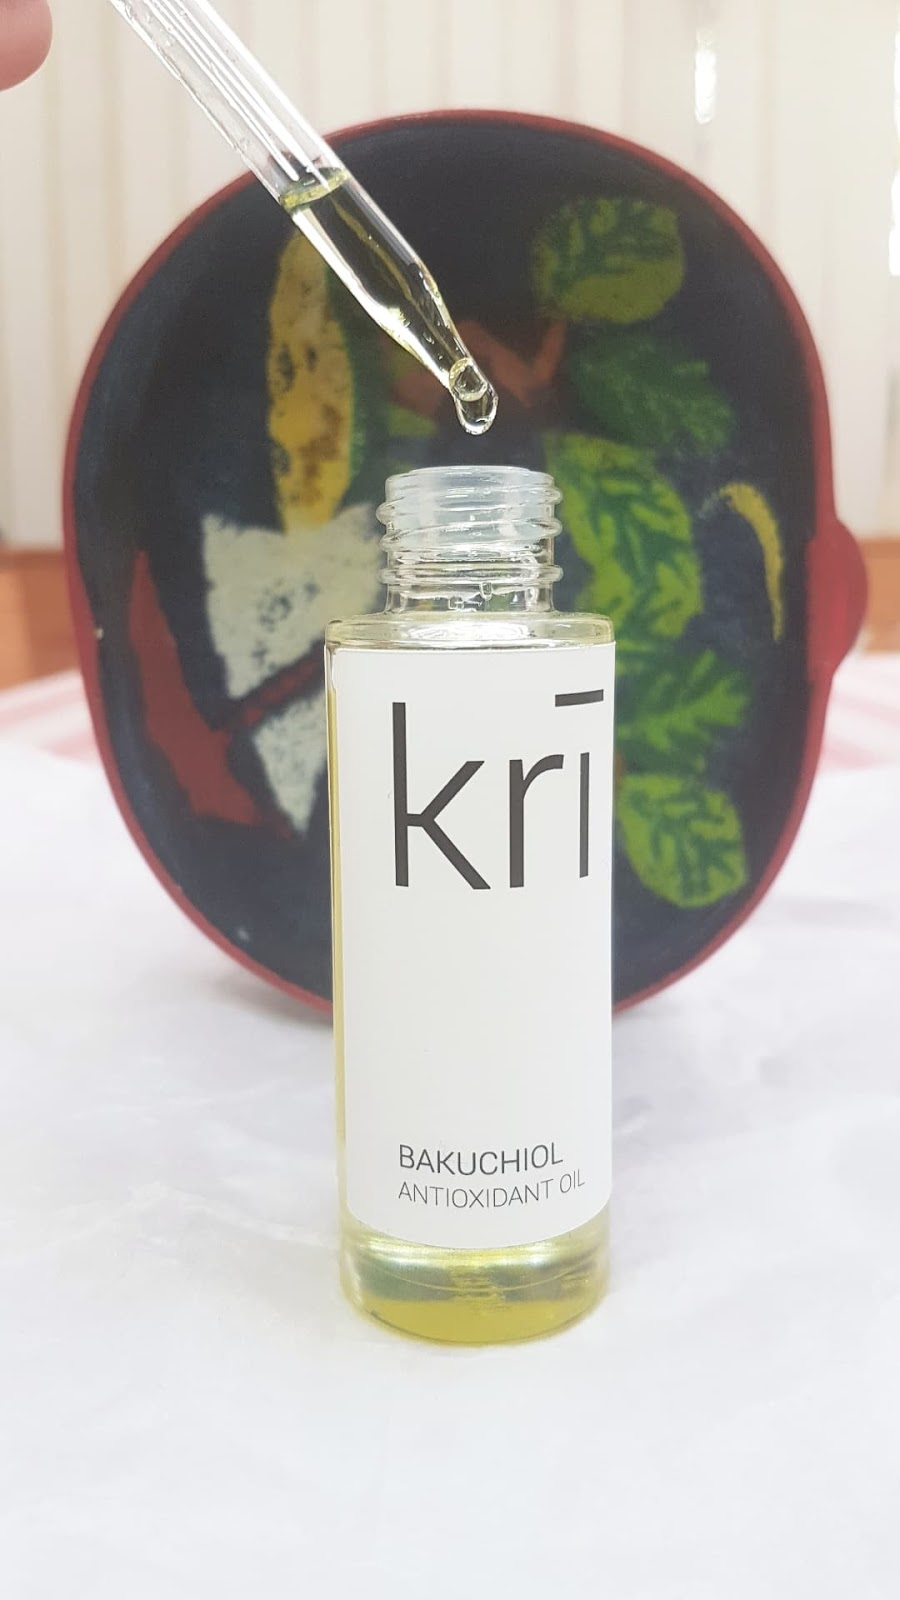 Kri Skincare - Bakuchiol Antioxidant Oil Review